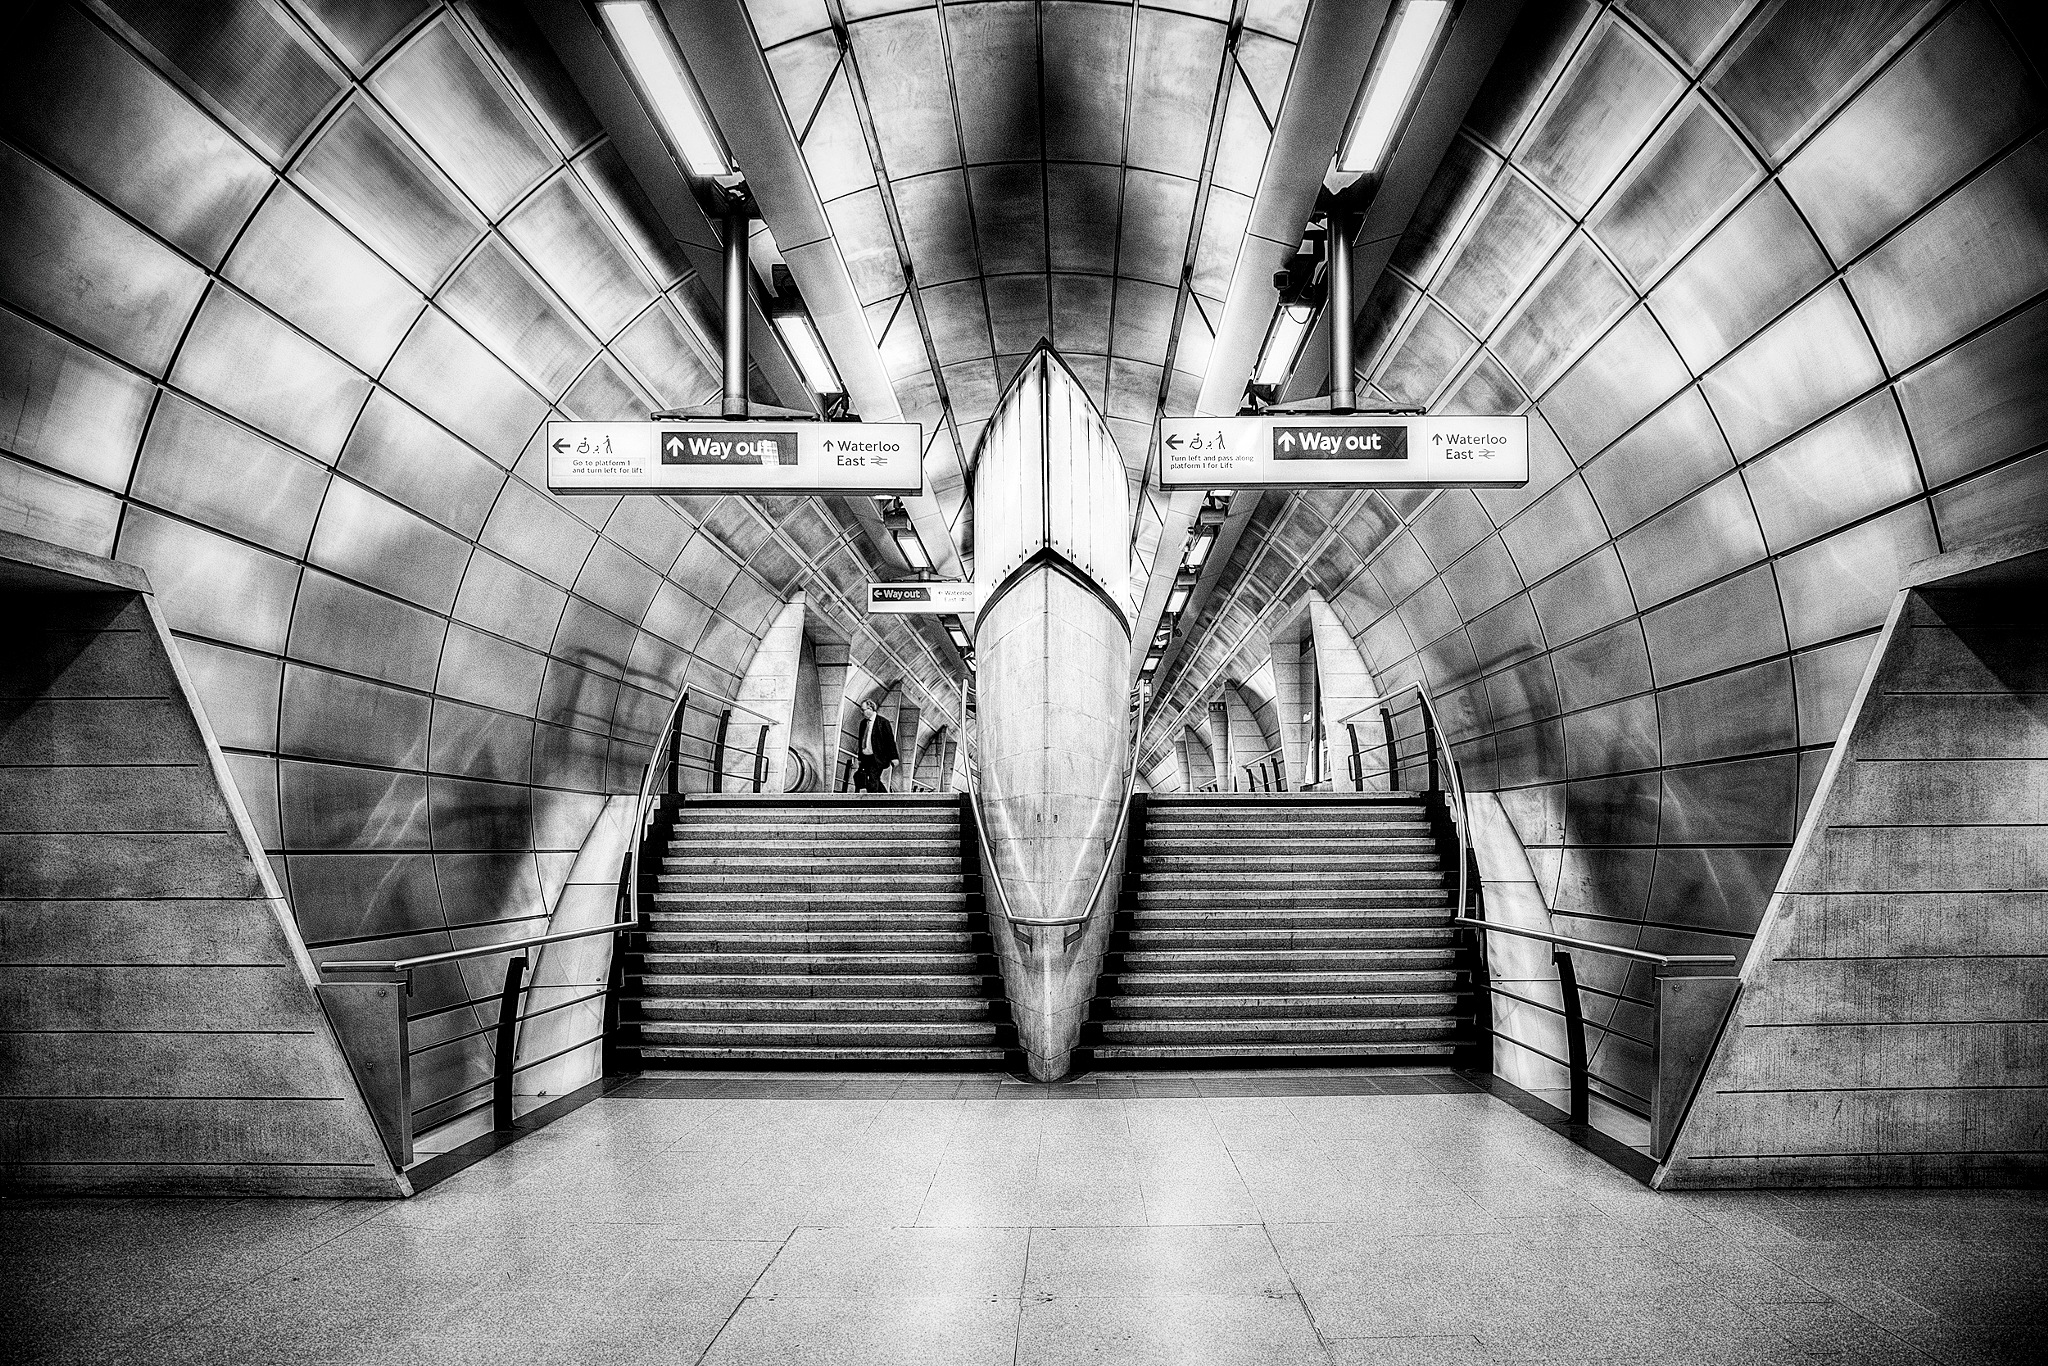 Alone in the metro by Maurits De Groen